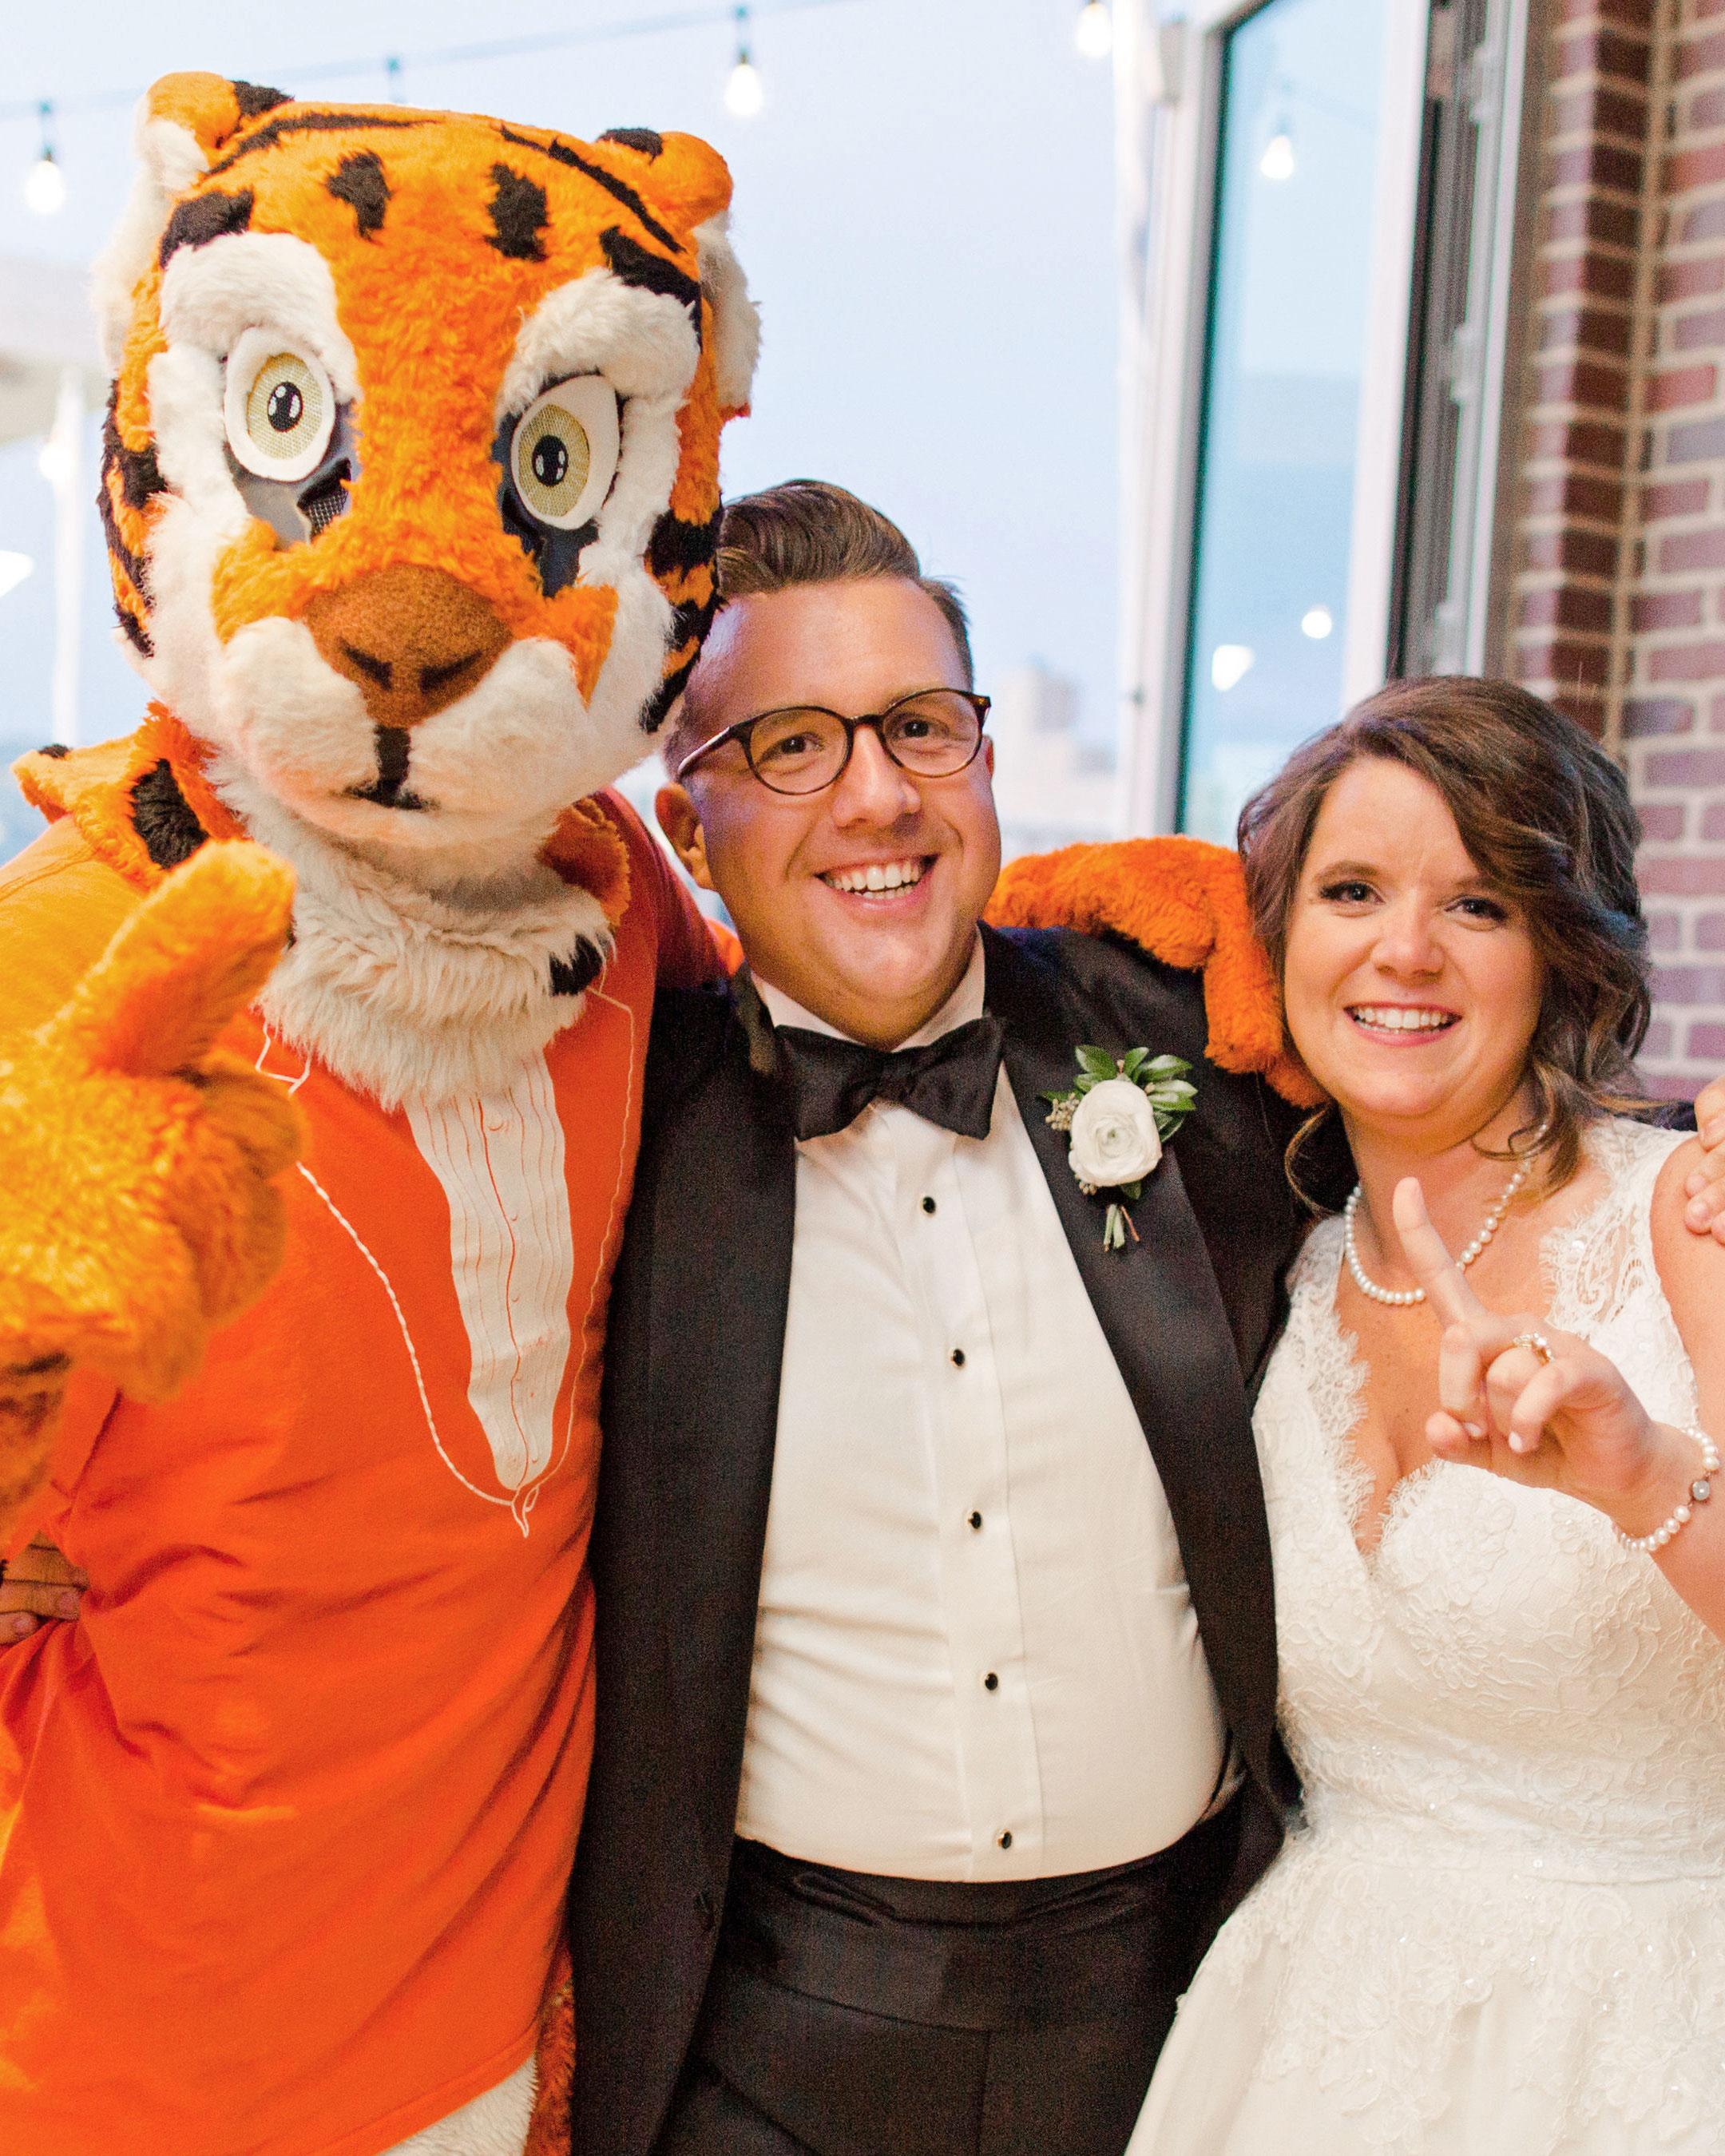 carey jared wedding mascot